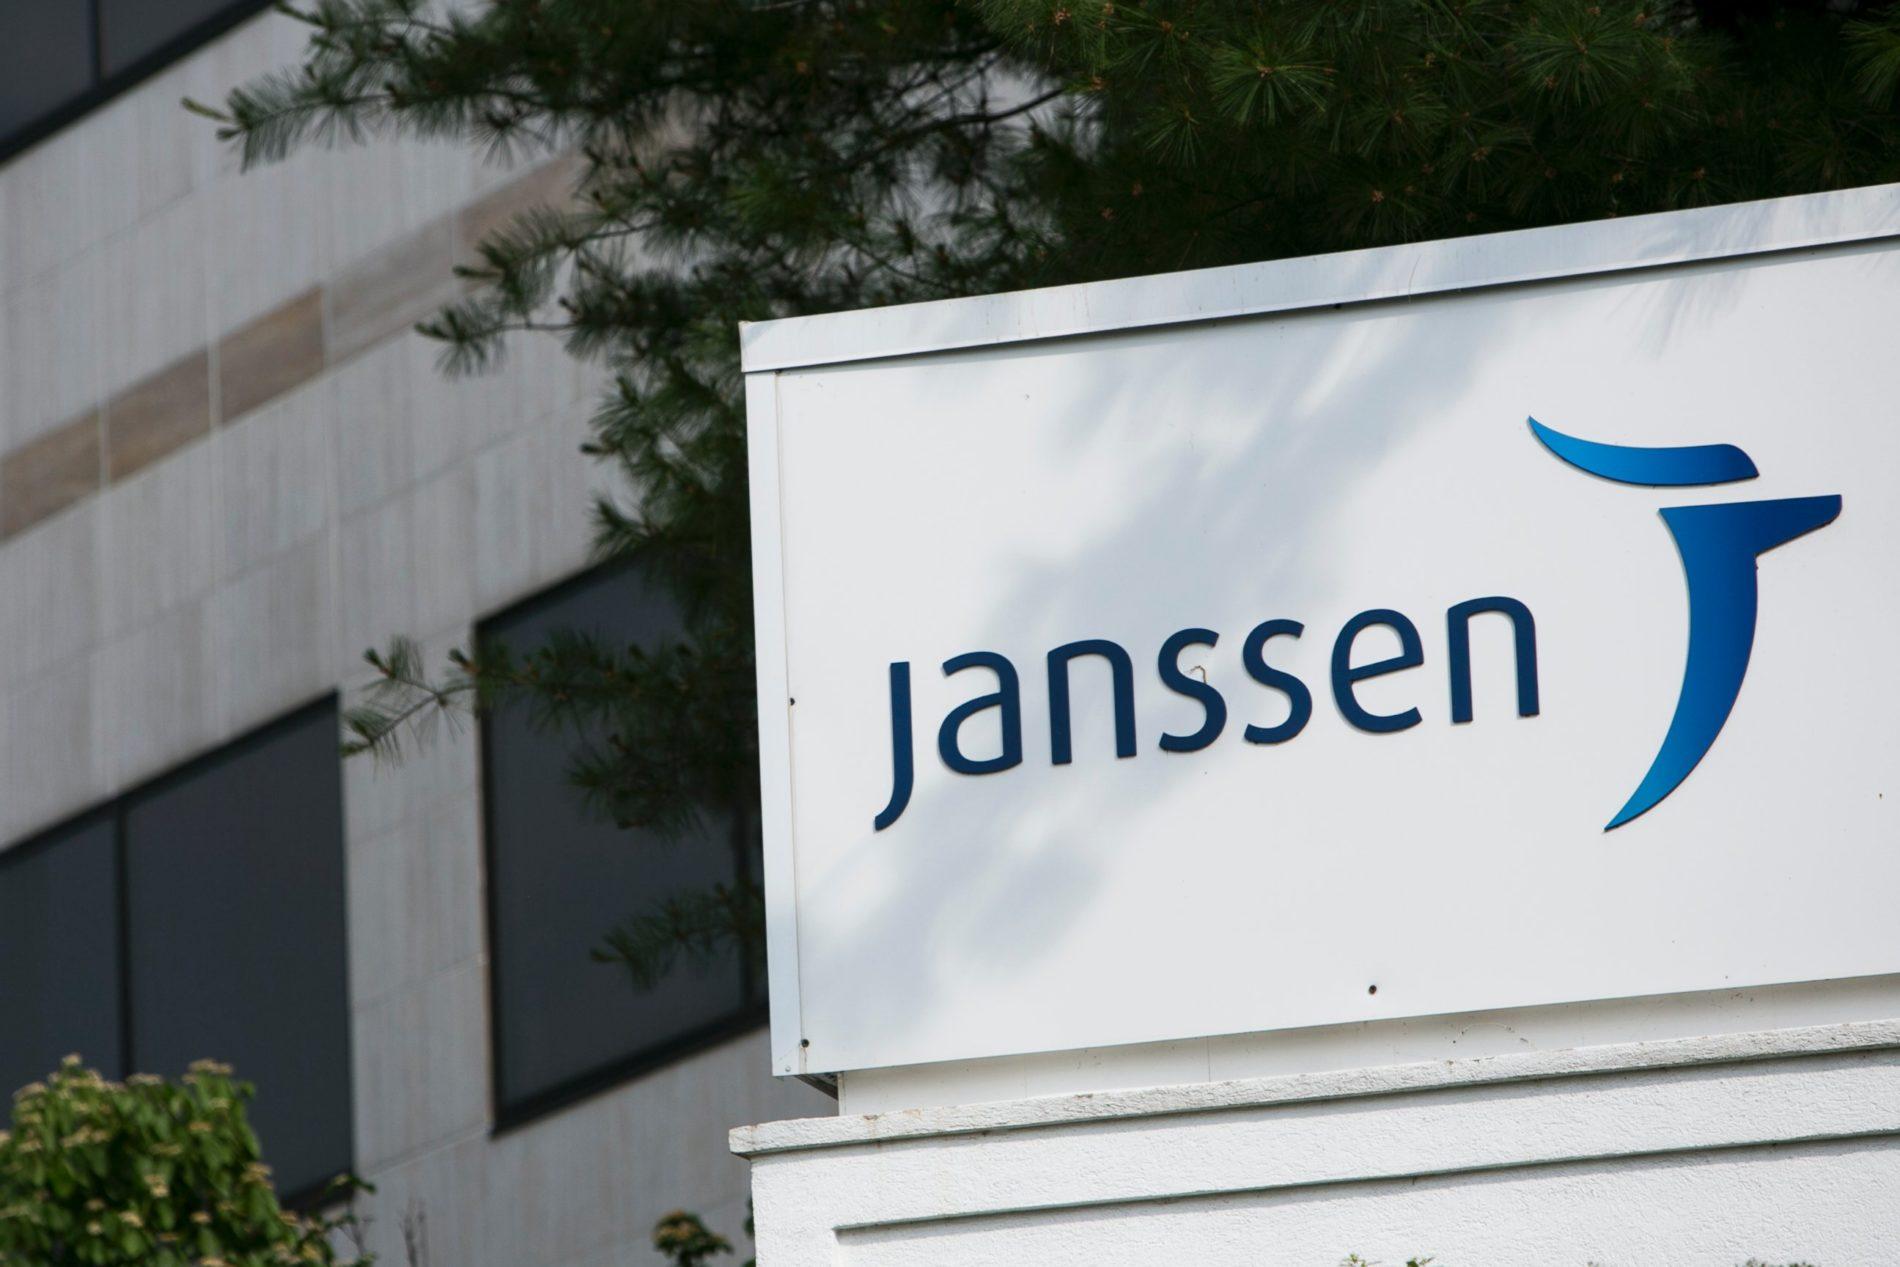 Janssen pharmaceutical companies: Σημαντική διάκριση στα Healthcare Business Awards 2021